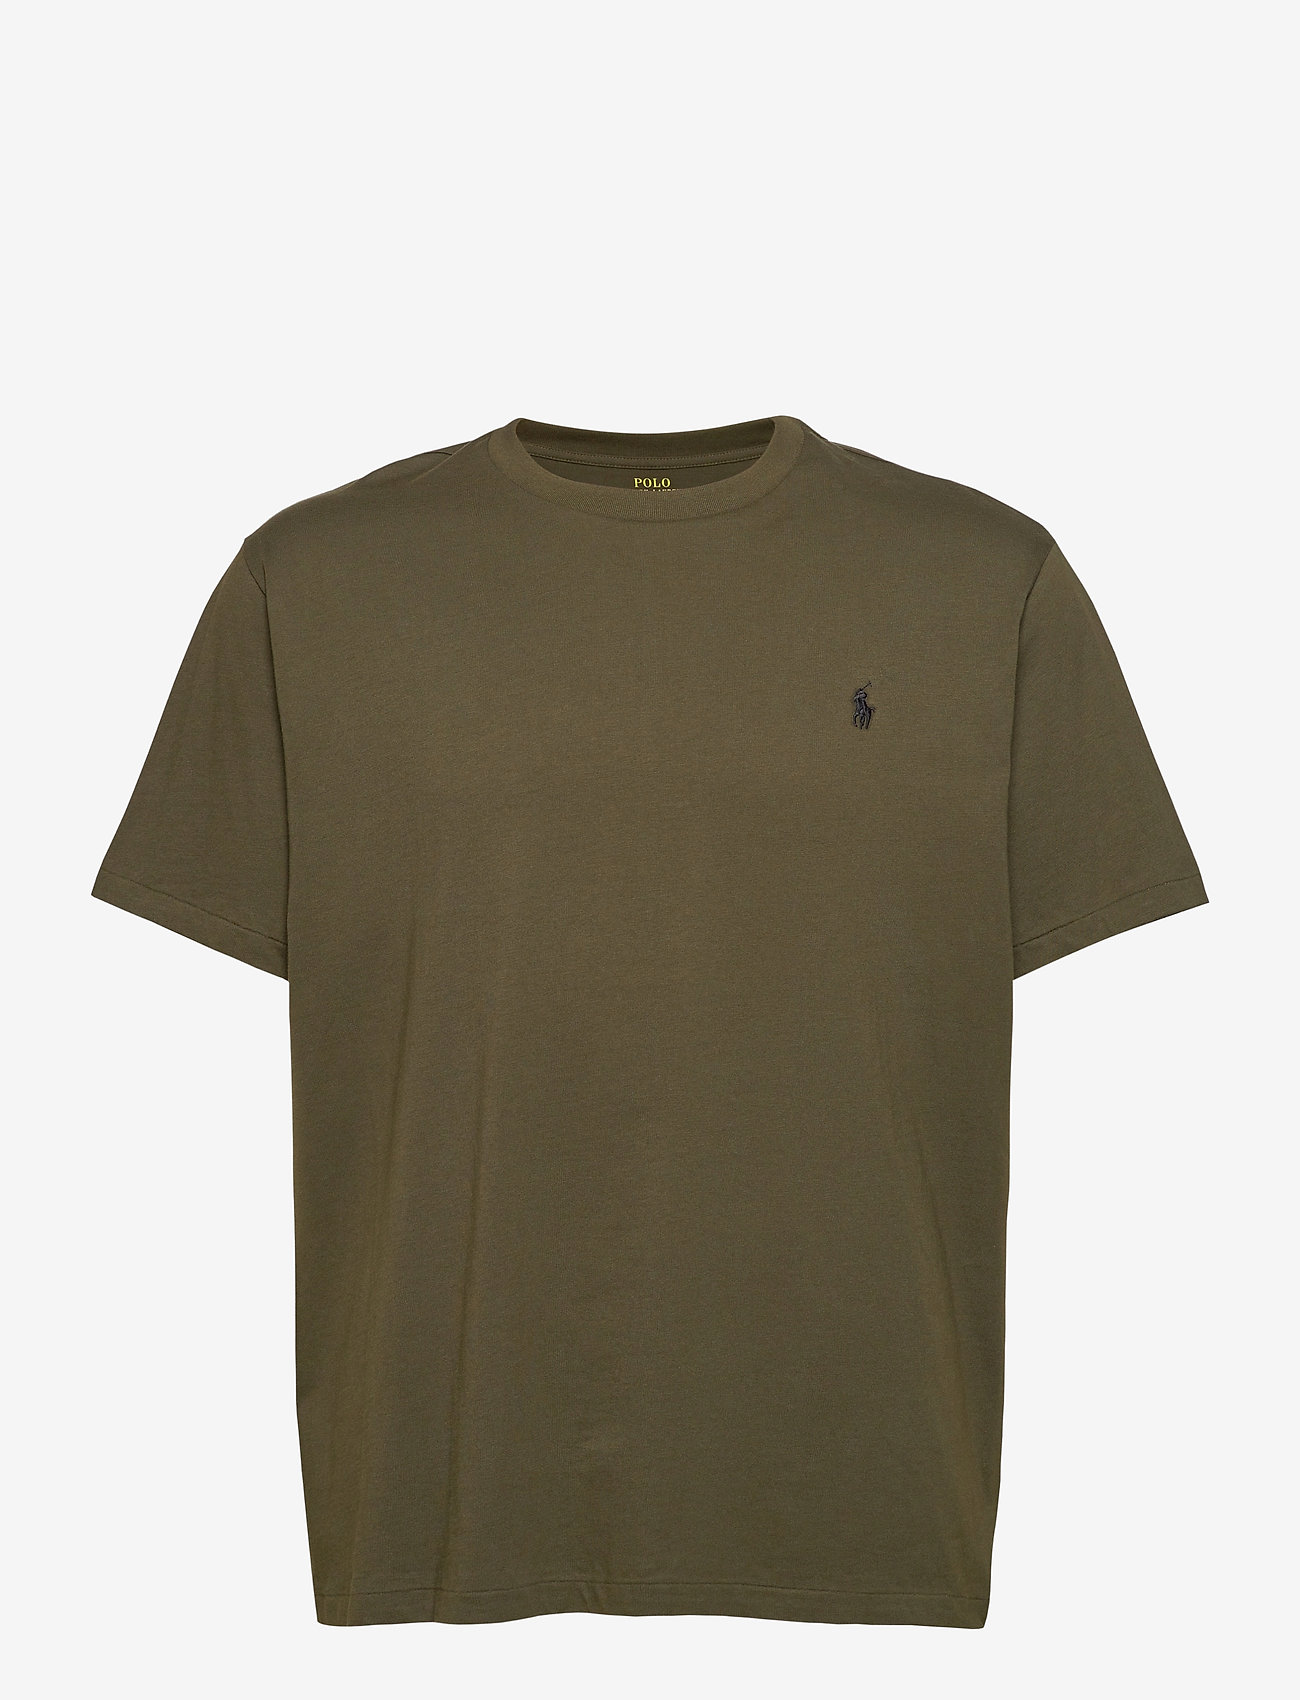 Polo Ralph Lauren Big & Tall - Classic Fit Crewneck Tee - basic t-shirts - company olive/c97 - 1